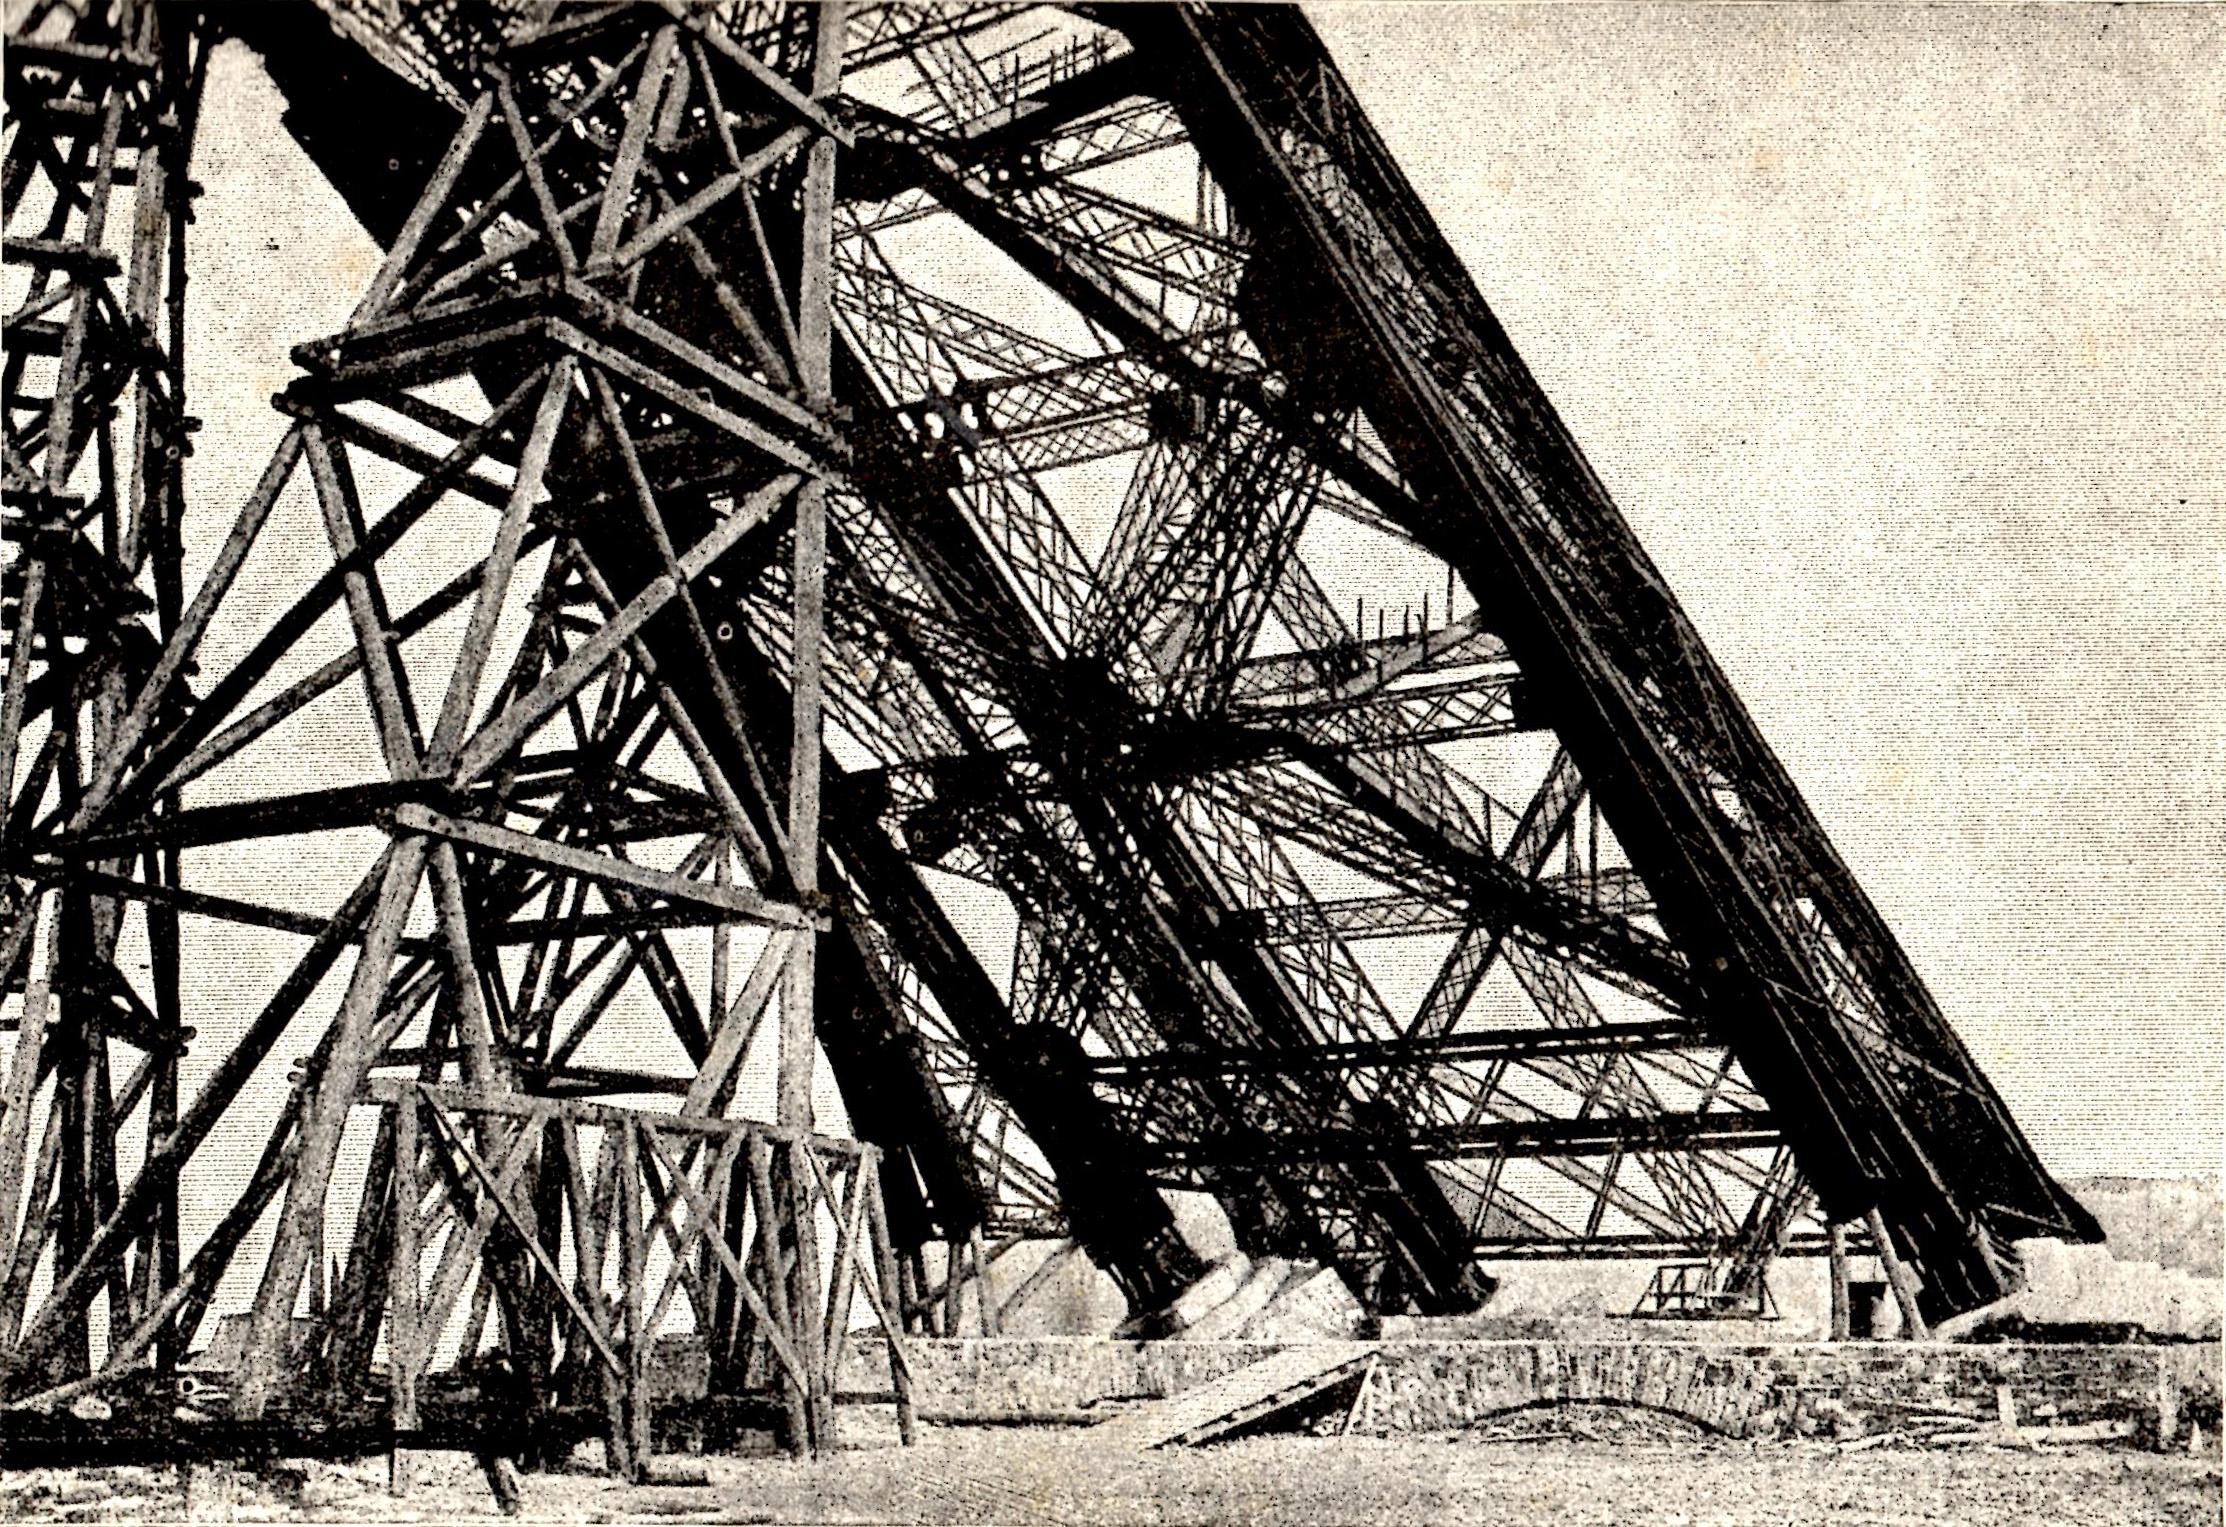 File:Construction, pile Tour Eiffel.jpg - Wikimedia Commons